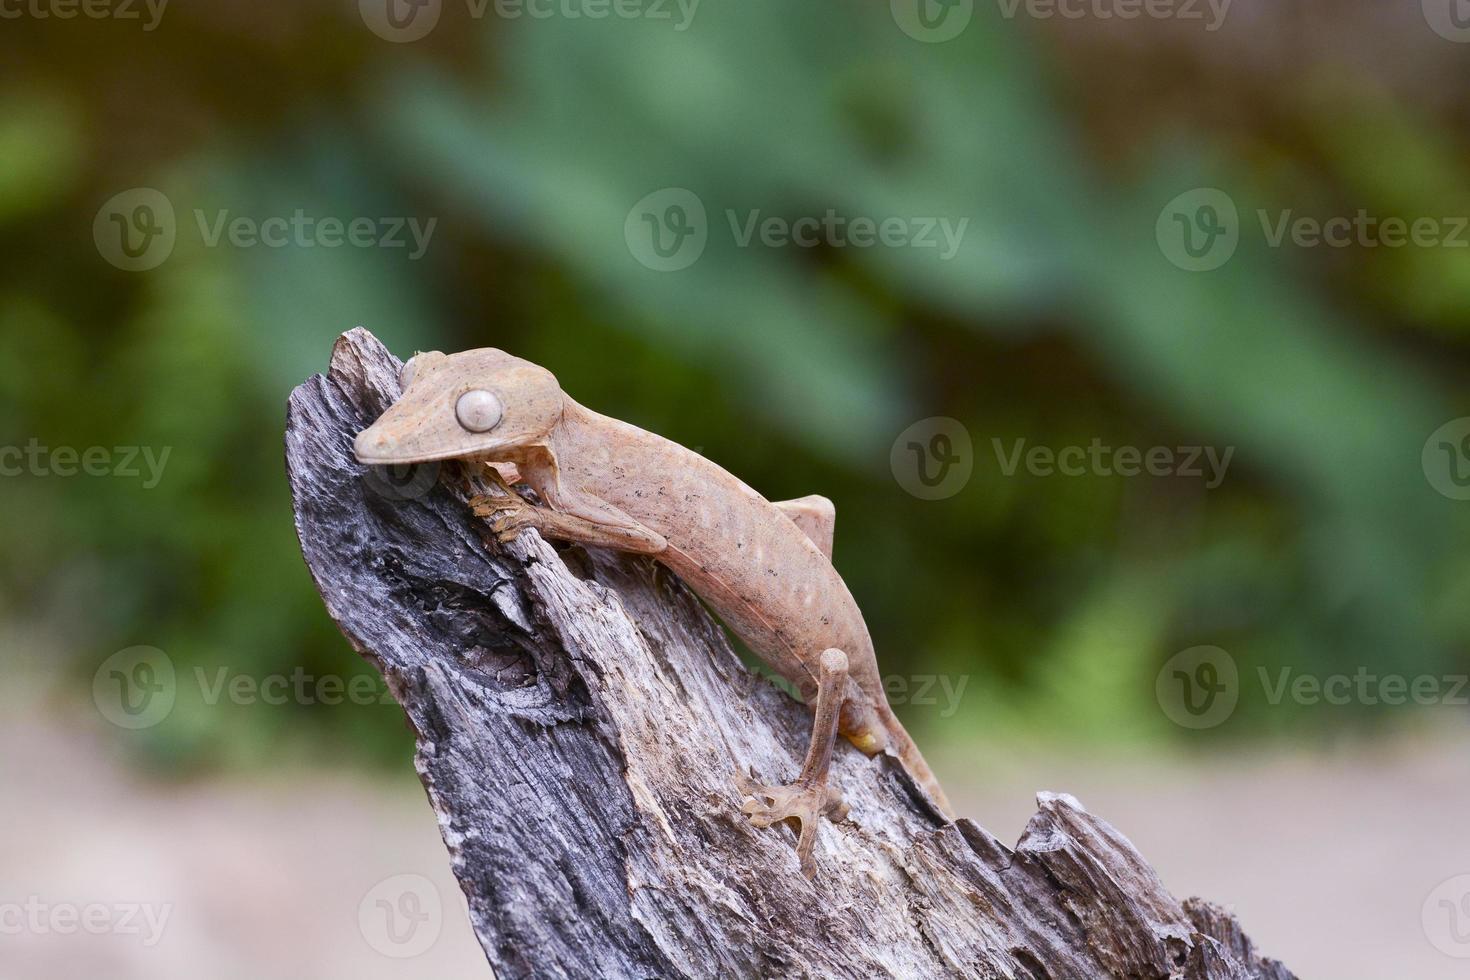 gefütterter Blattschwanzgecko (Uroplatus), Marozevo, Madagaskar foto